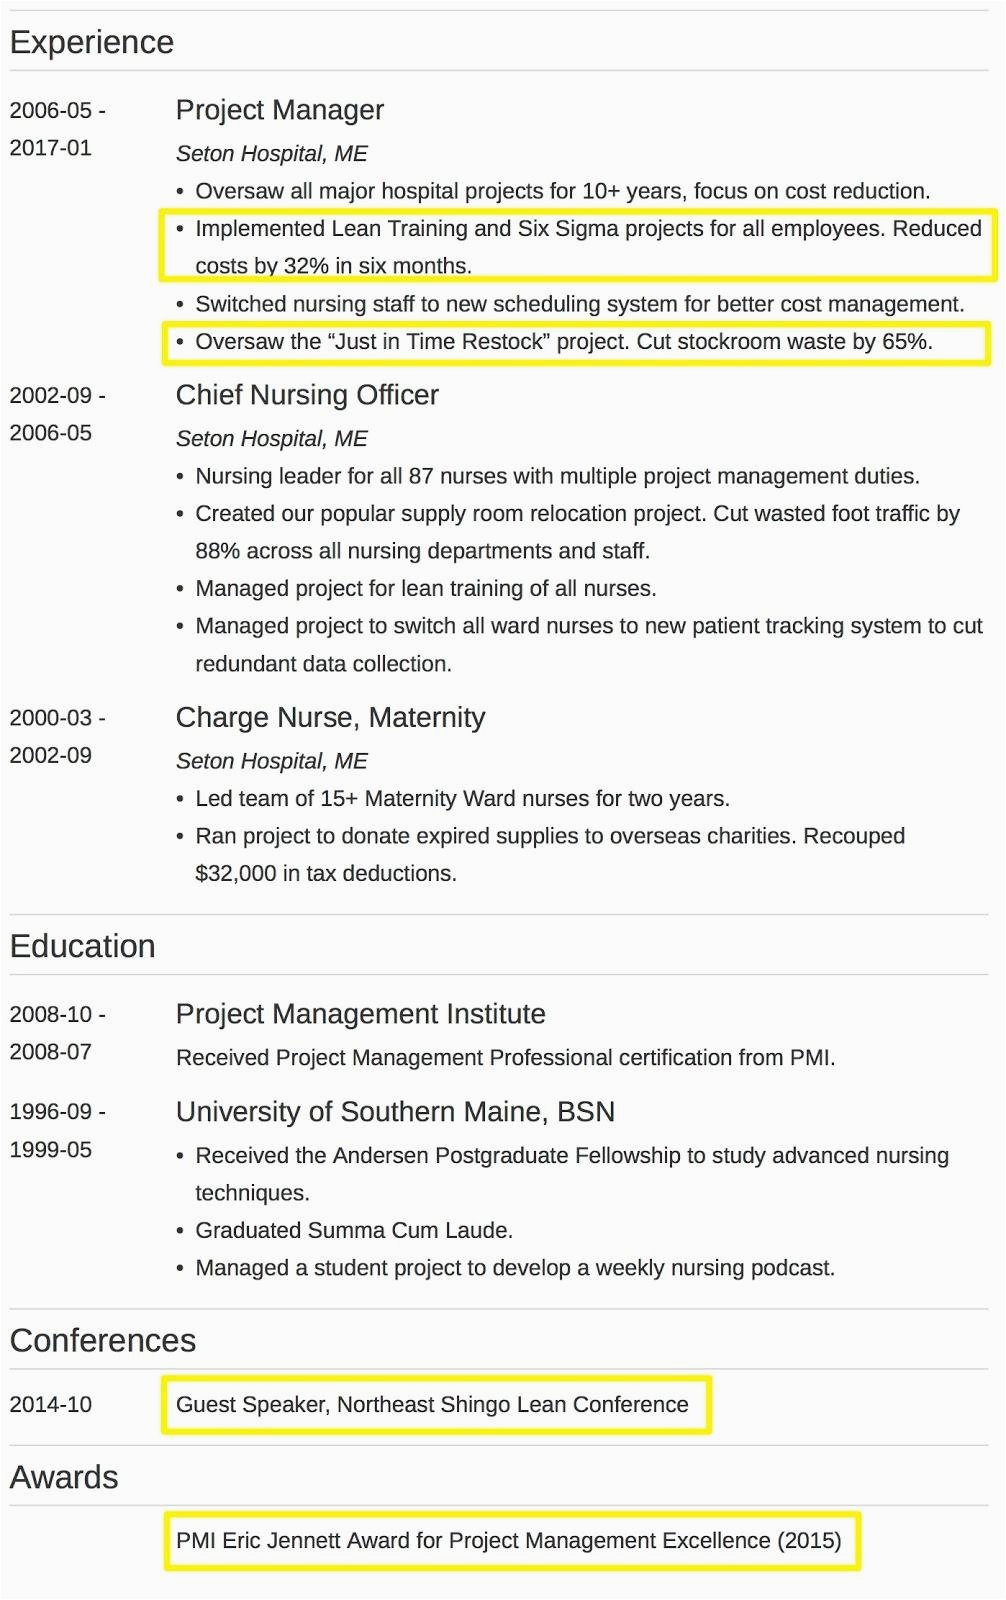 summary of qualifications